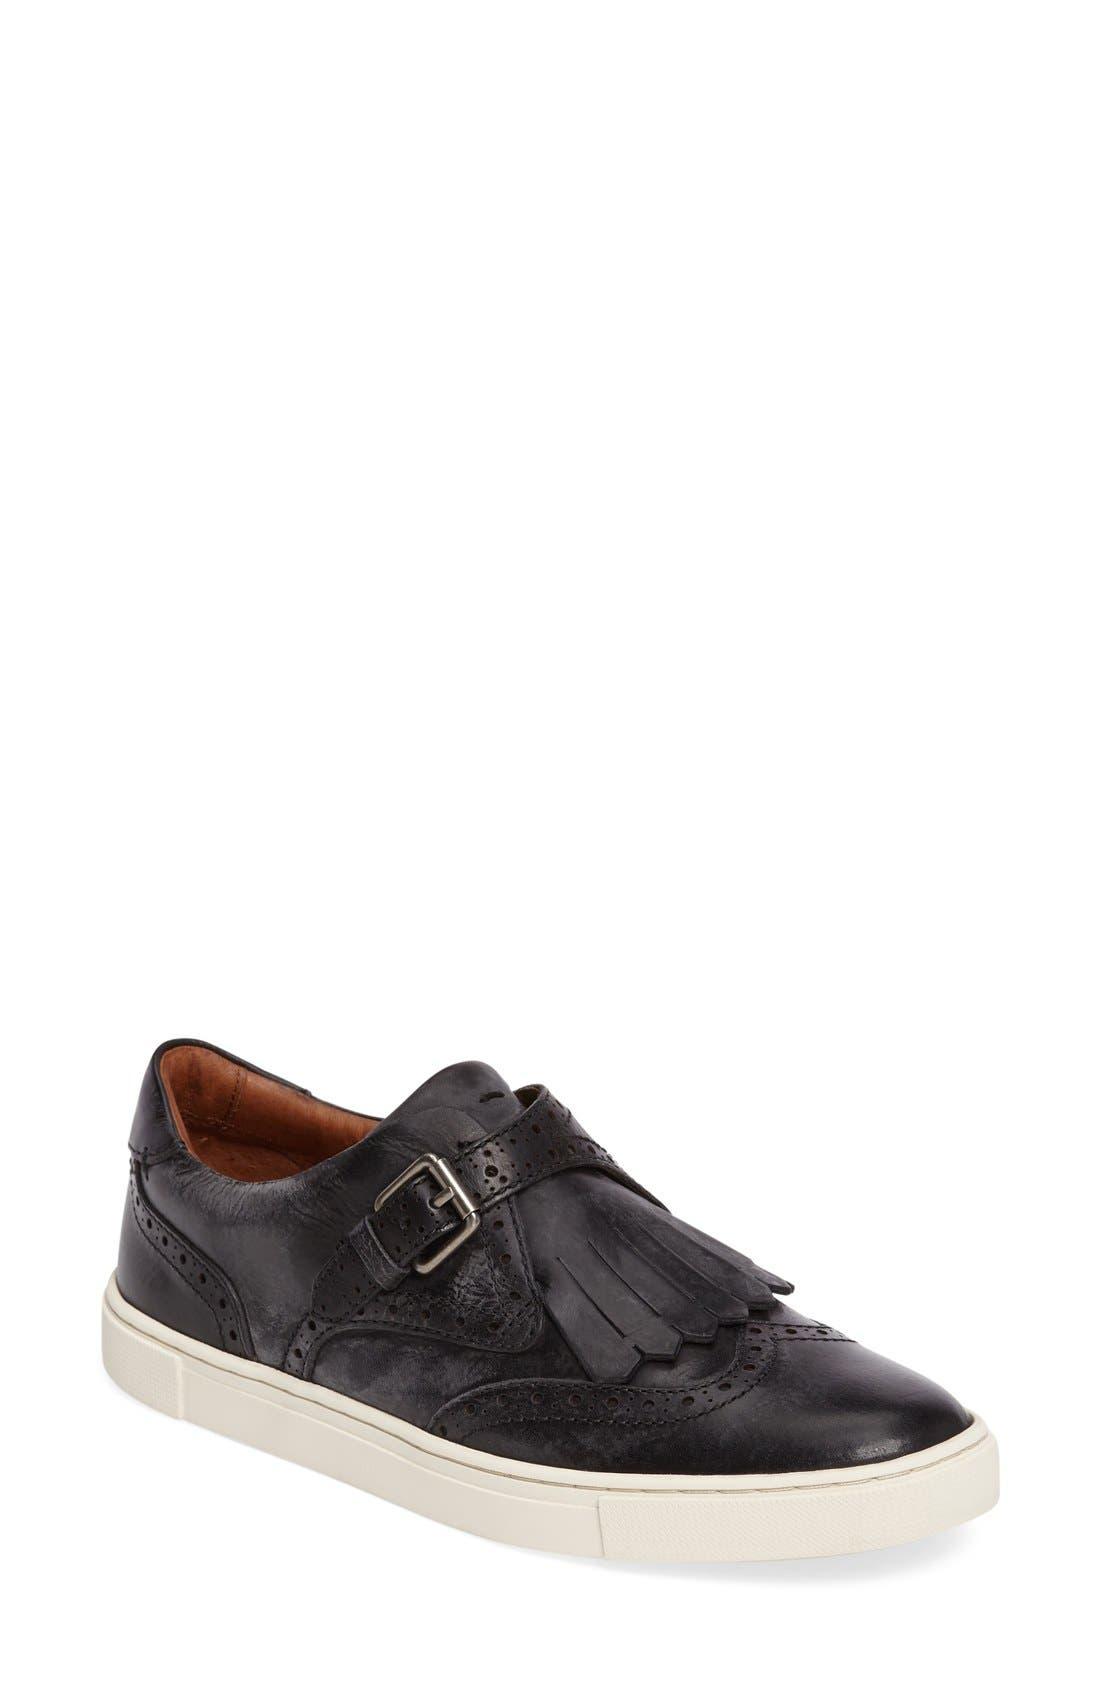 'Gemma' Kiltie Slip On-Sneaker,                             Main thumbnail 1, color,